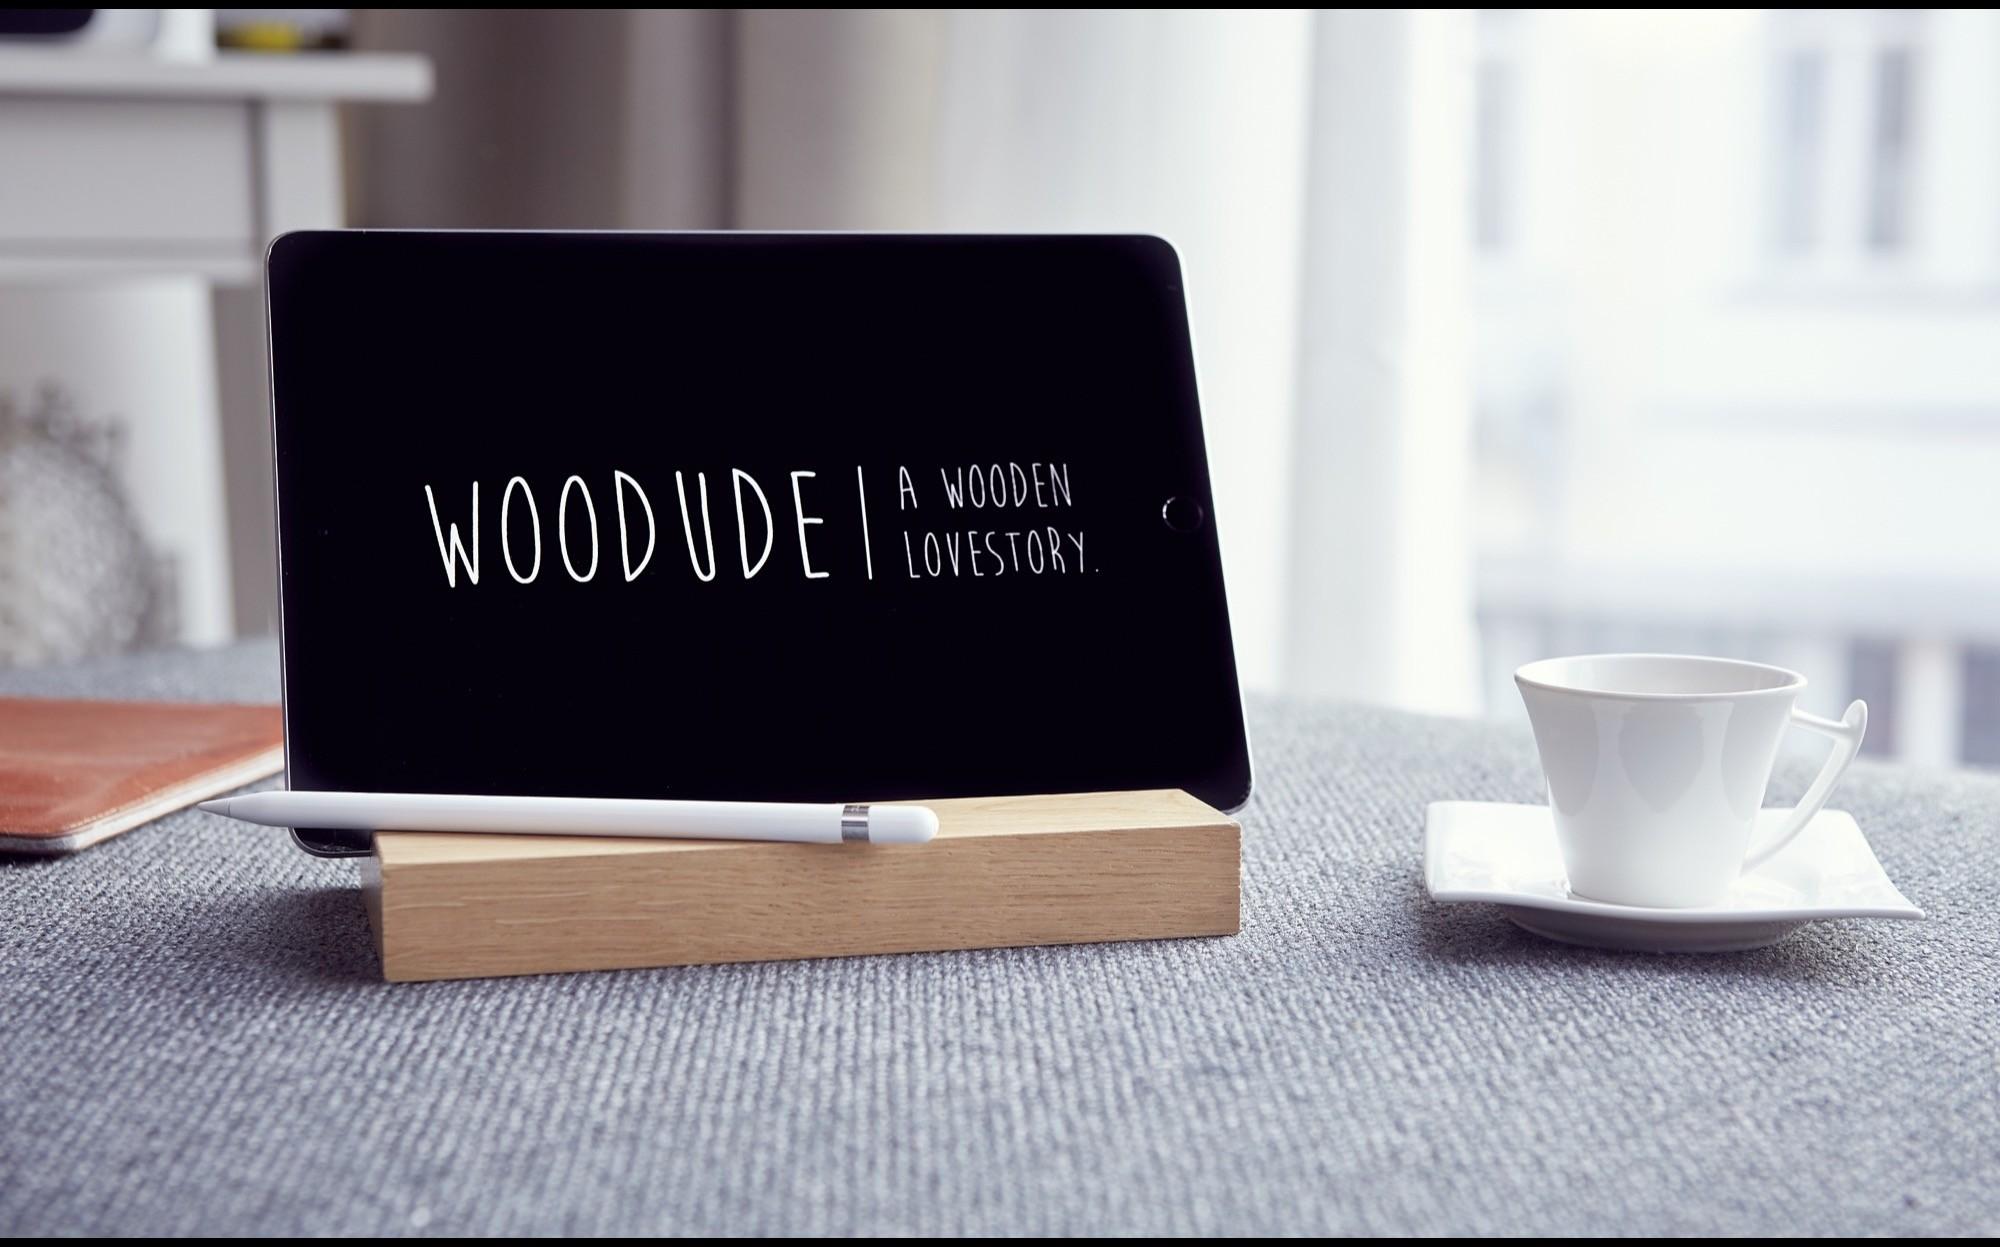 michel ipad halterung aus holz bicycledudes. Black Bedroom Furniture Sets. Home Design Ideas